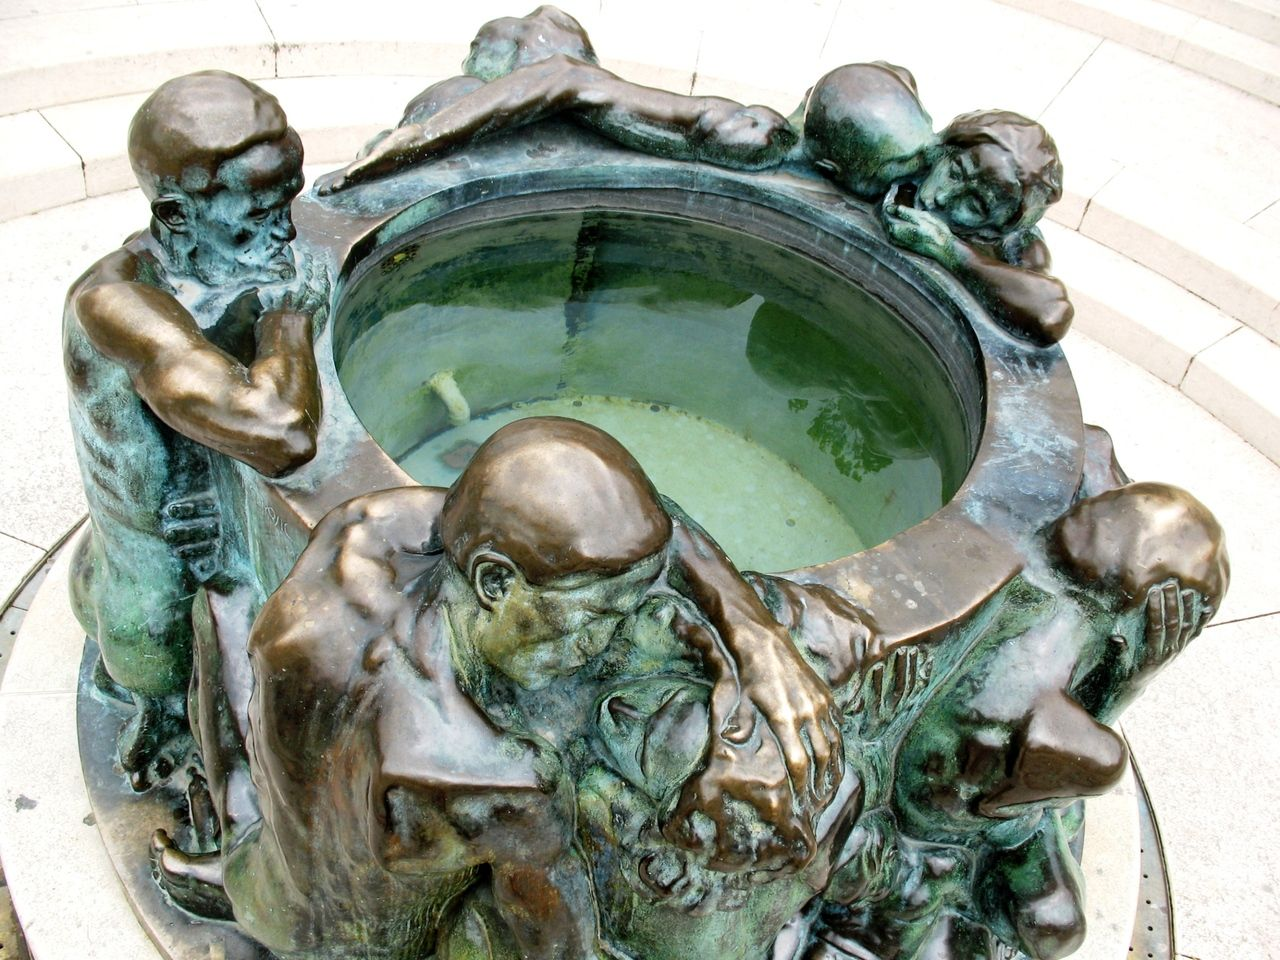 Zdenac Zivota Mestrovic Zagreb Art Deco Sculpture Art Ivan Mestrovic